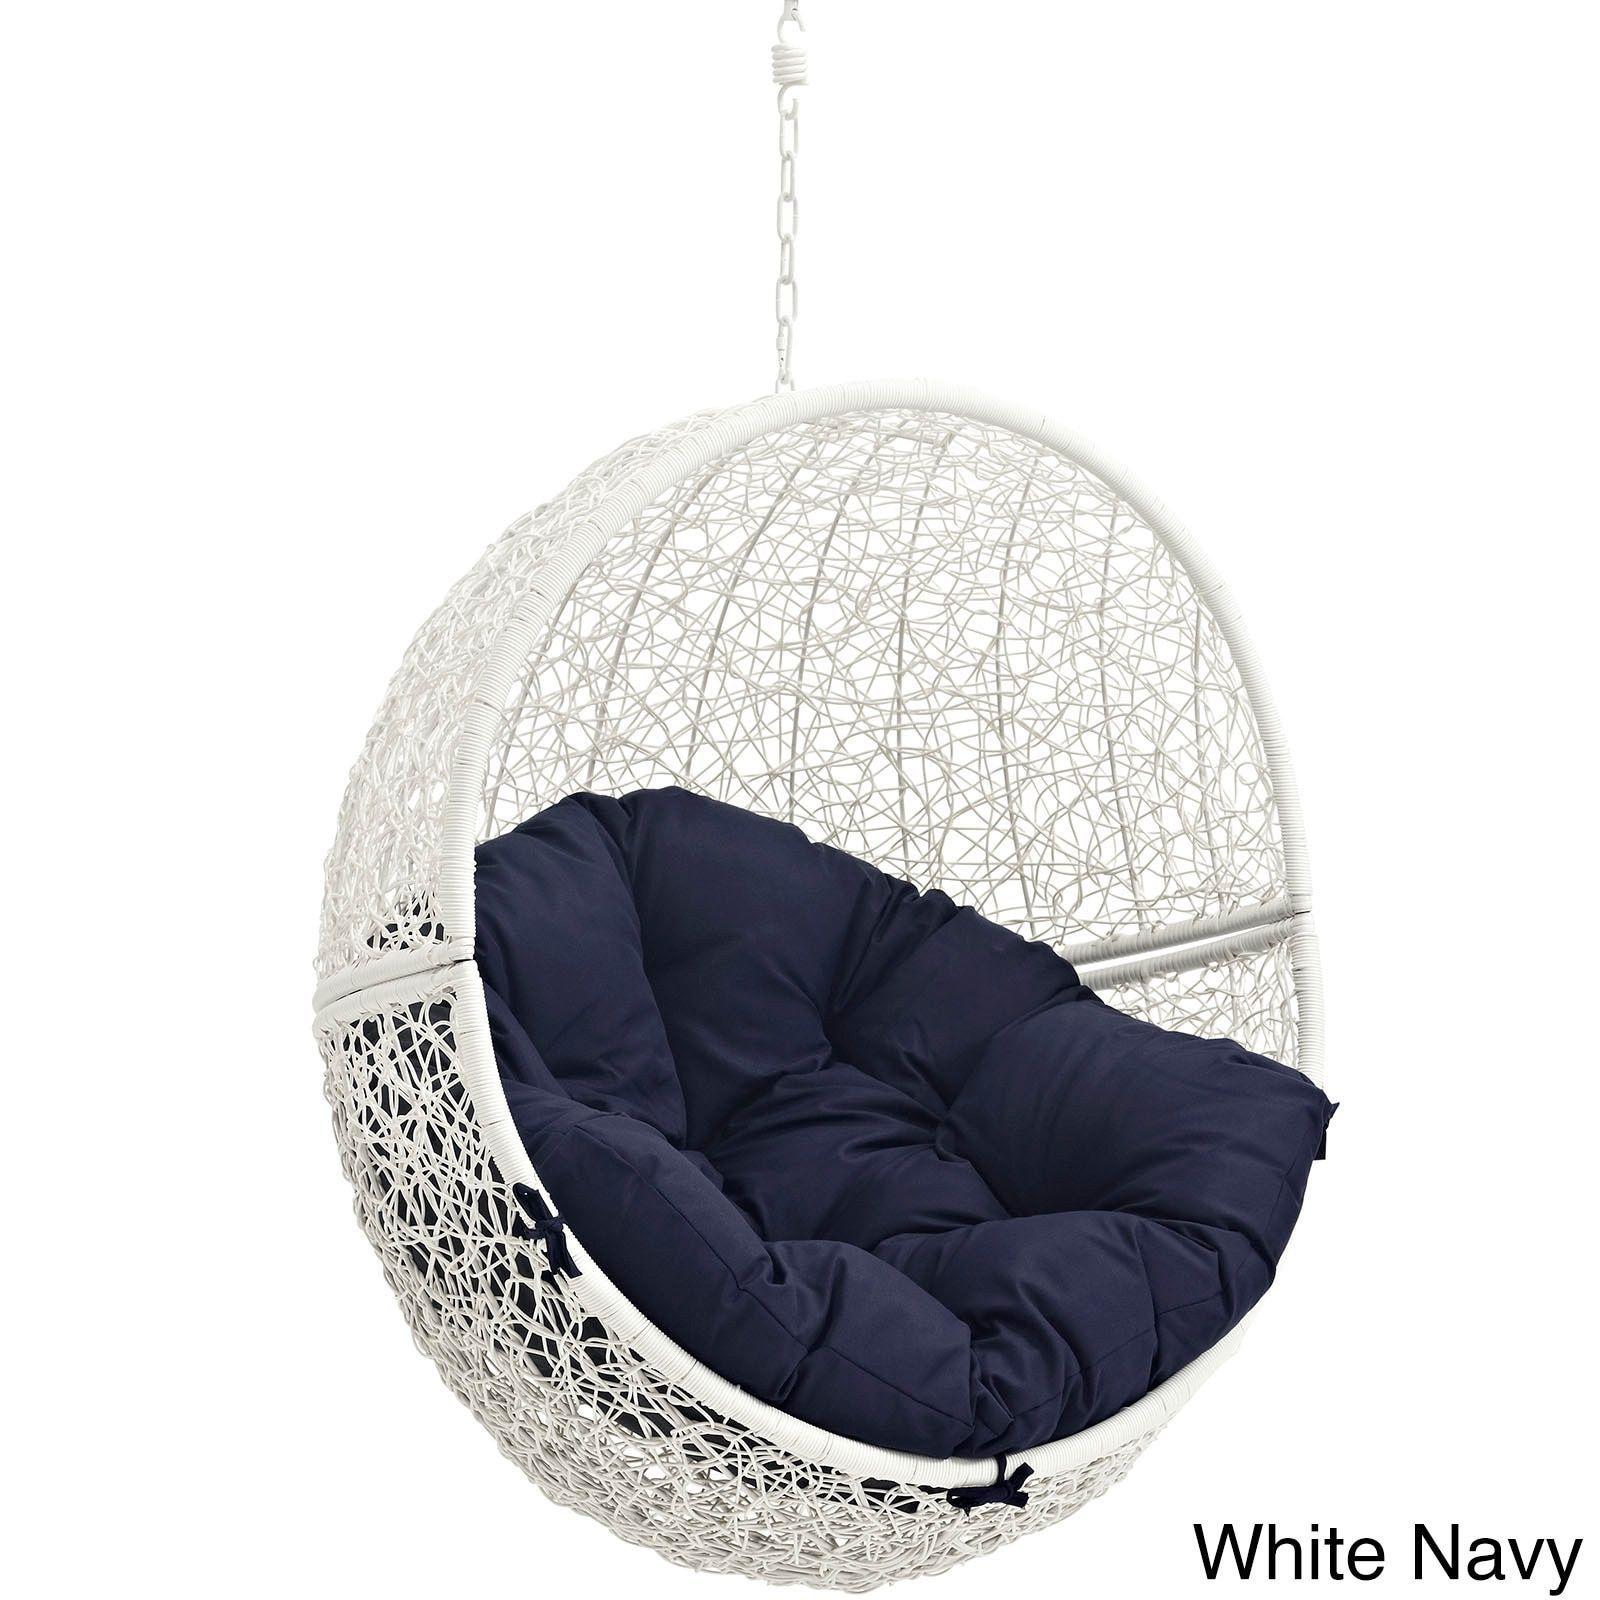 Modway Cloak Outdoor Patio Swing Chair (gray Beige), Patio Furniture